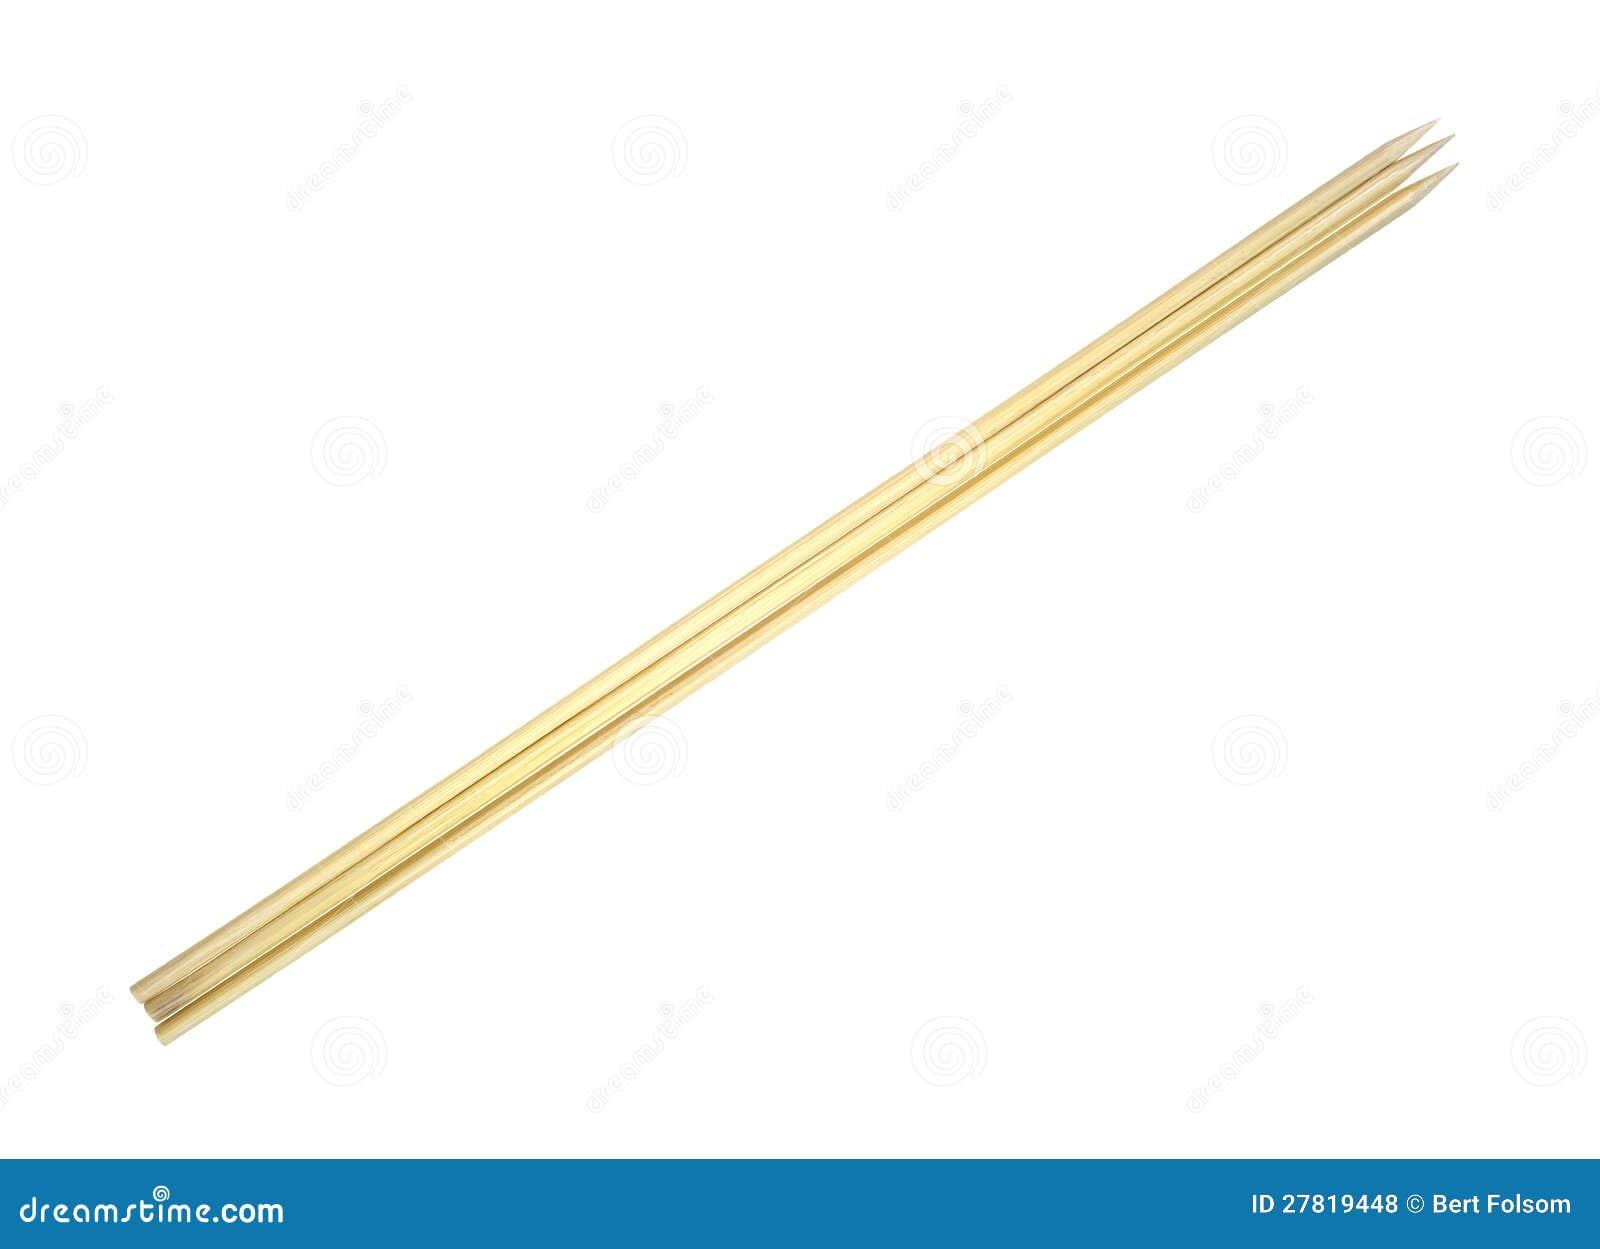 Ручки протыкальника